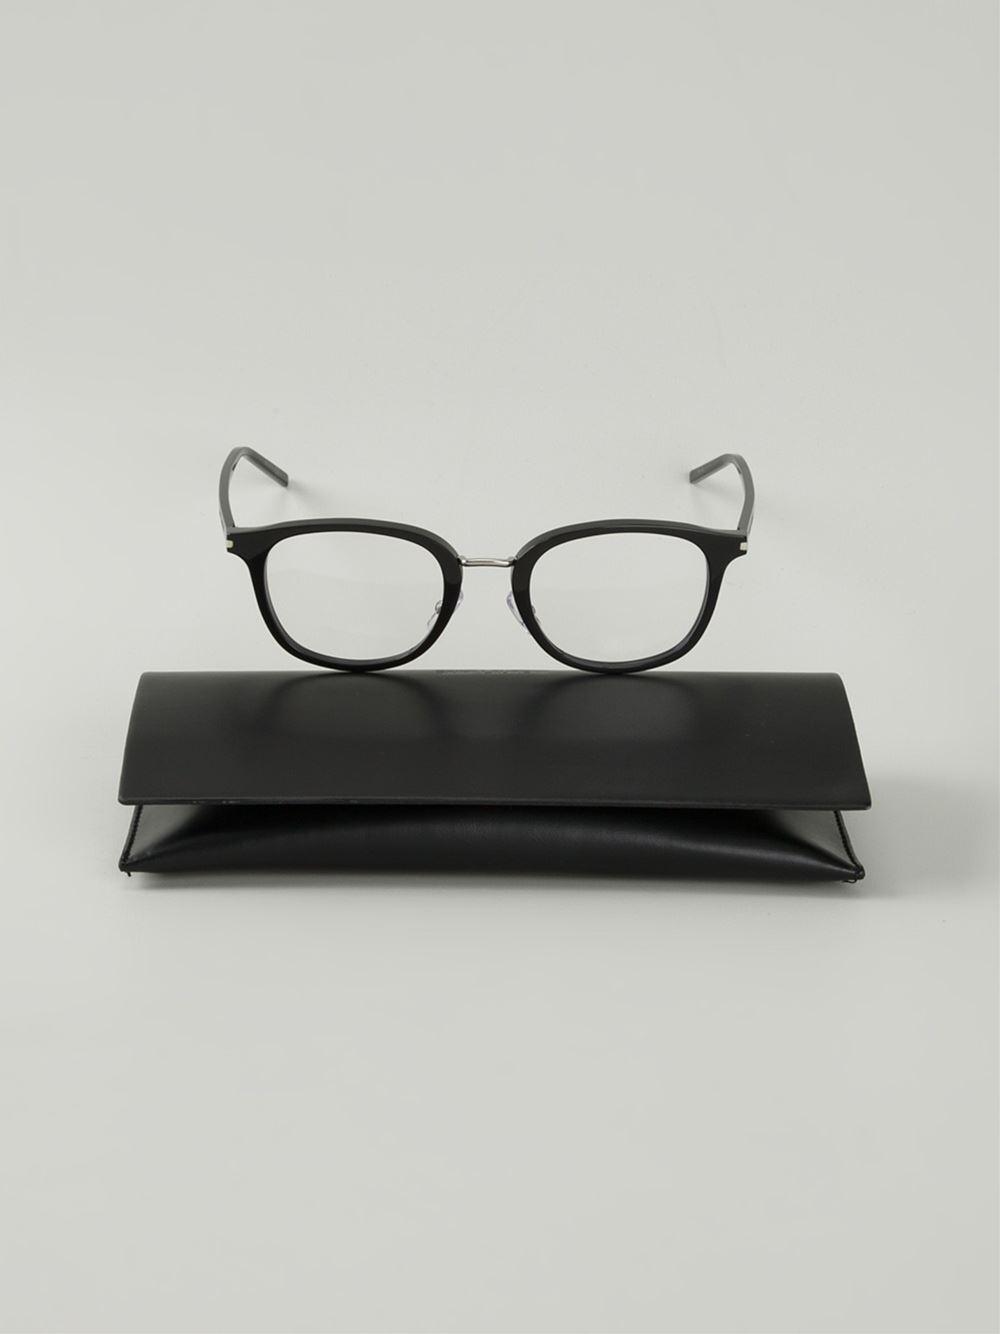 3a9f63c959 Saint Laurent Square Optical Frames in Black for Men - Lyst